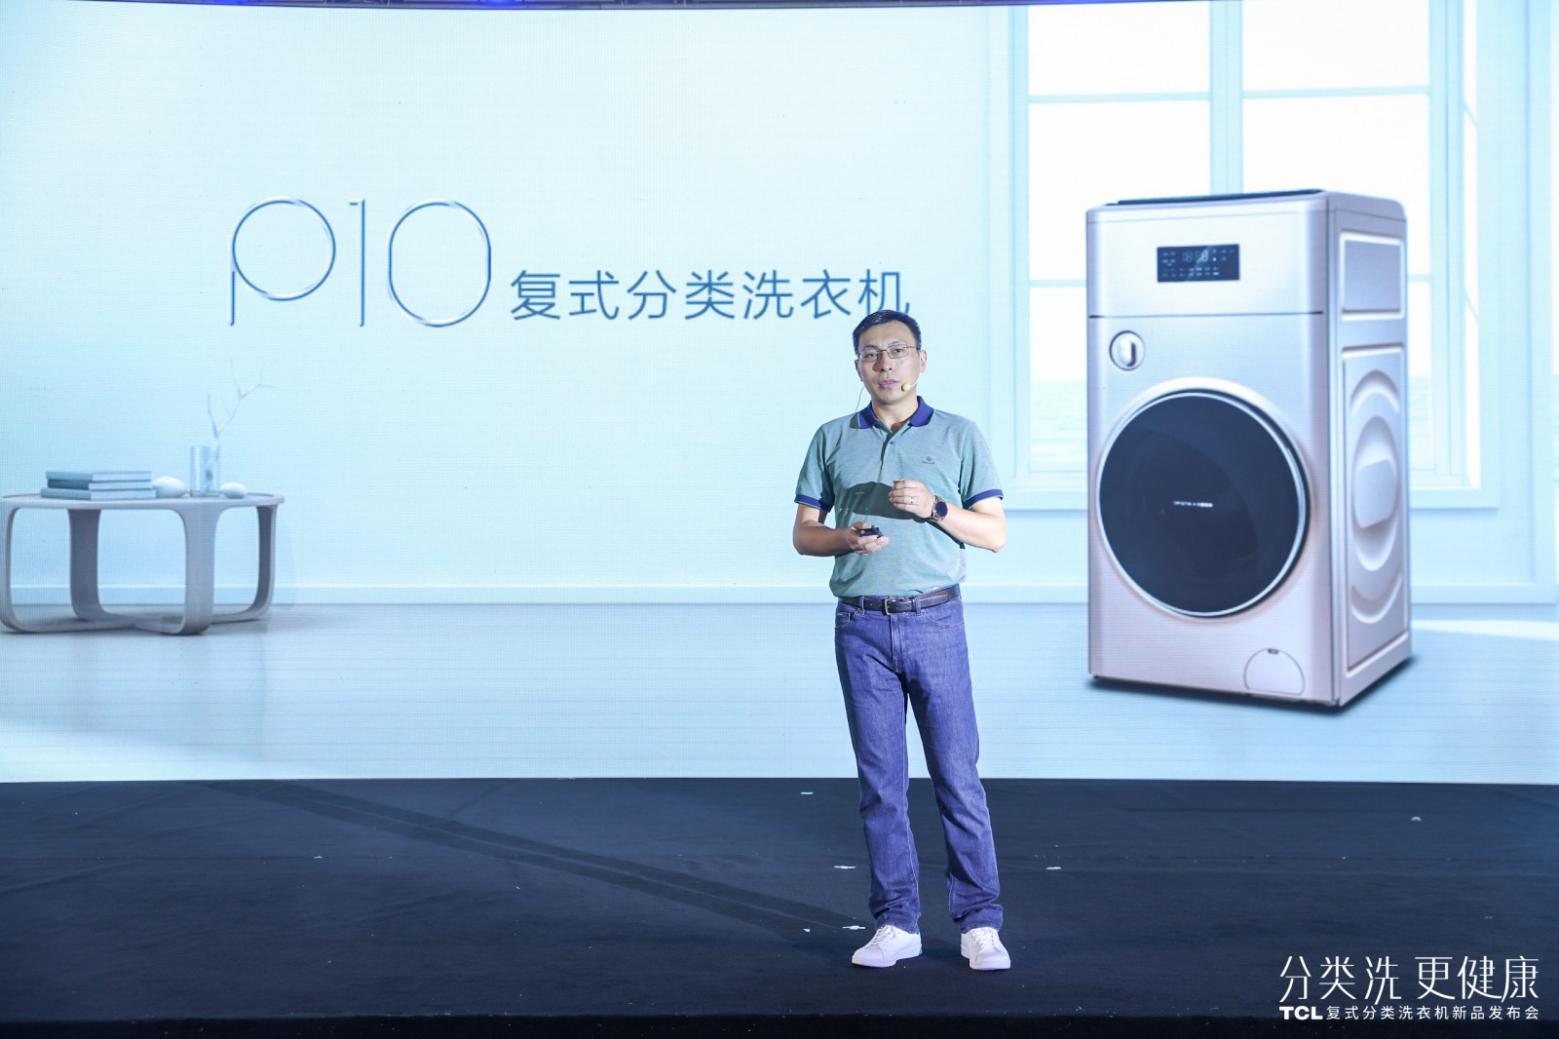 2020TCL分类式洗衣机产品再升级 新品P10复式分类洗衣机发布